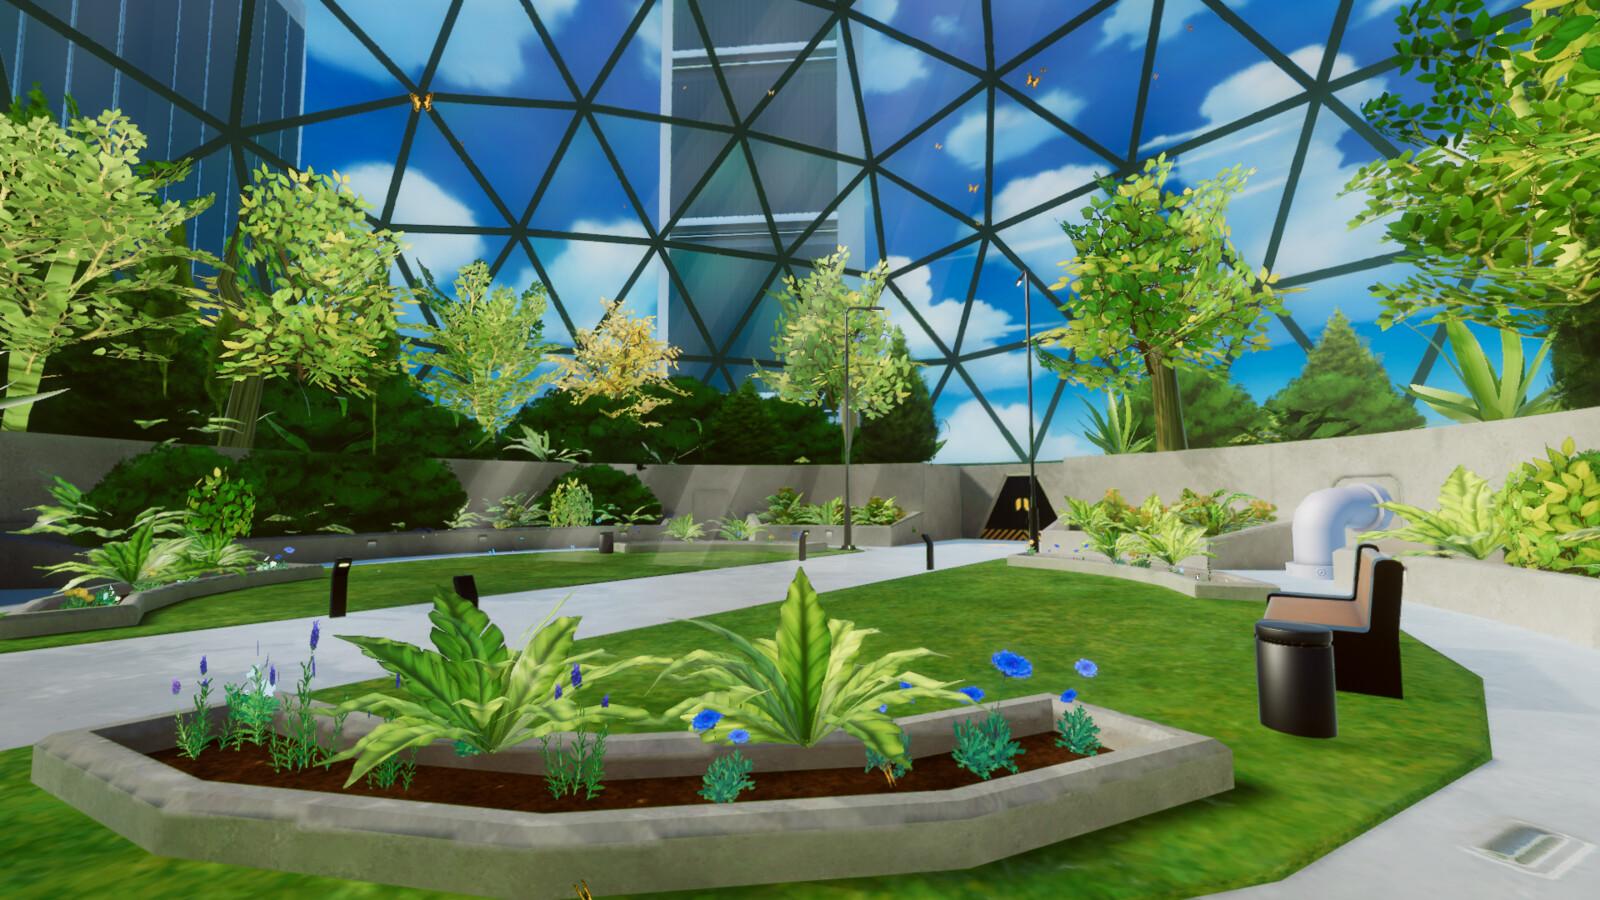 VR mobile stylized enviro dome park 4